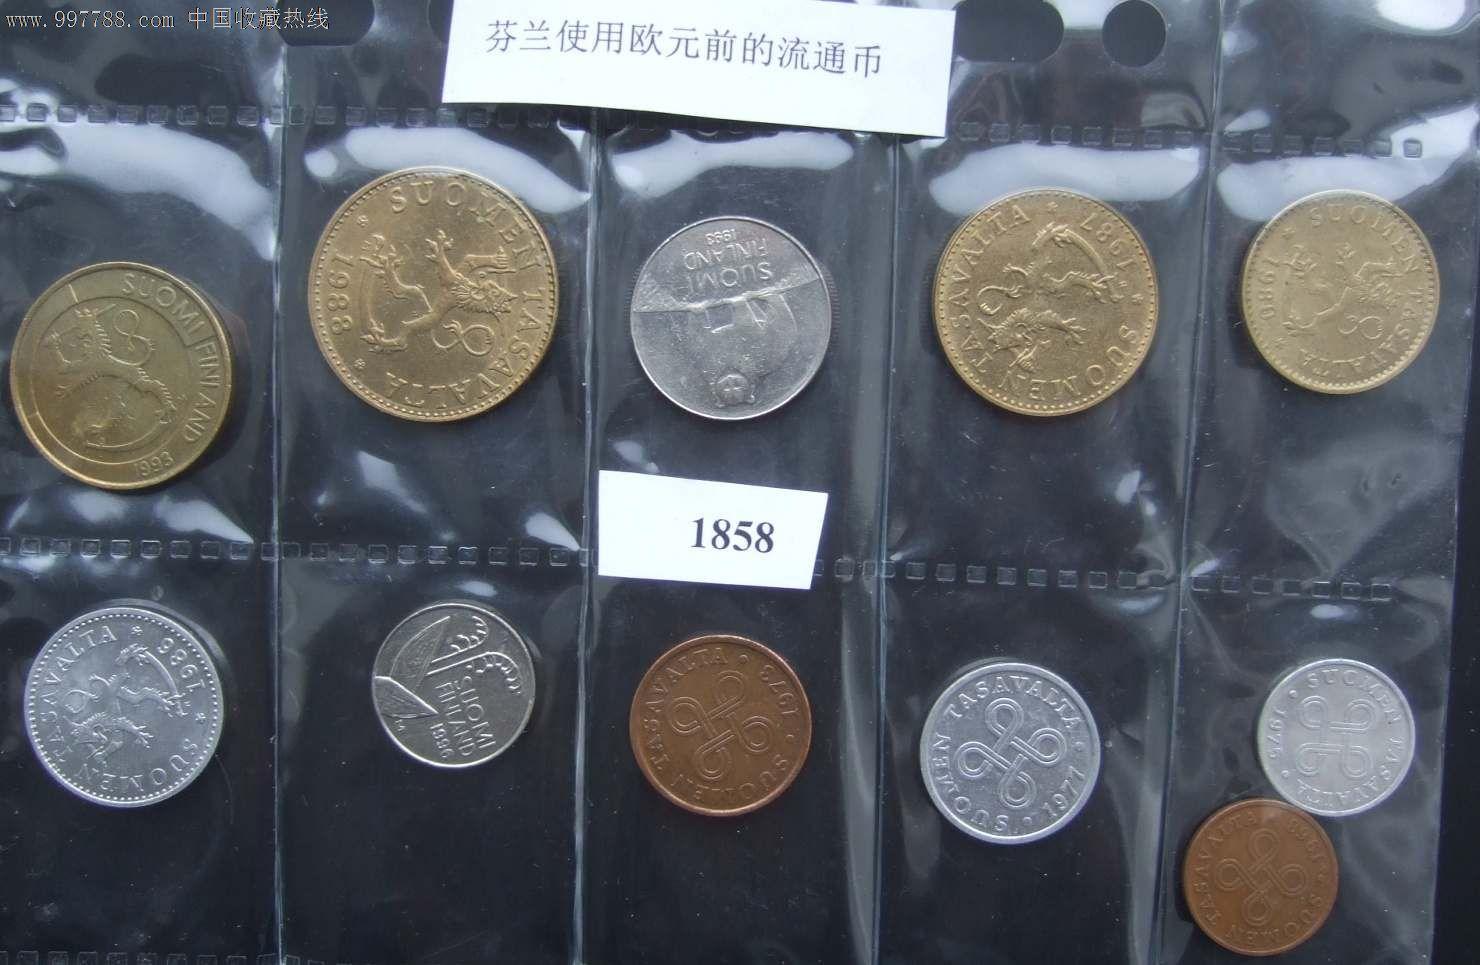 q币购买qq号_购买qq币_qq游戏币兑换q币吗